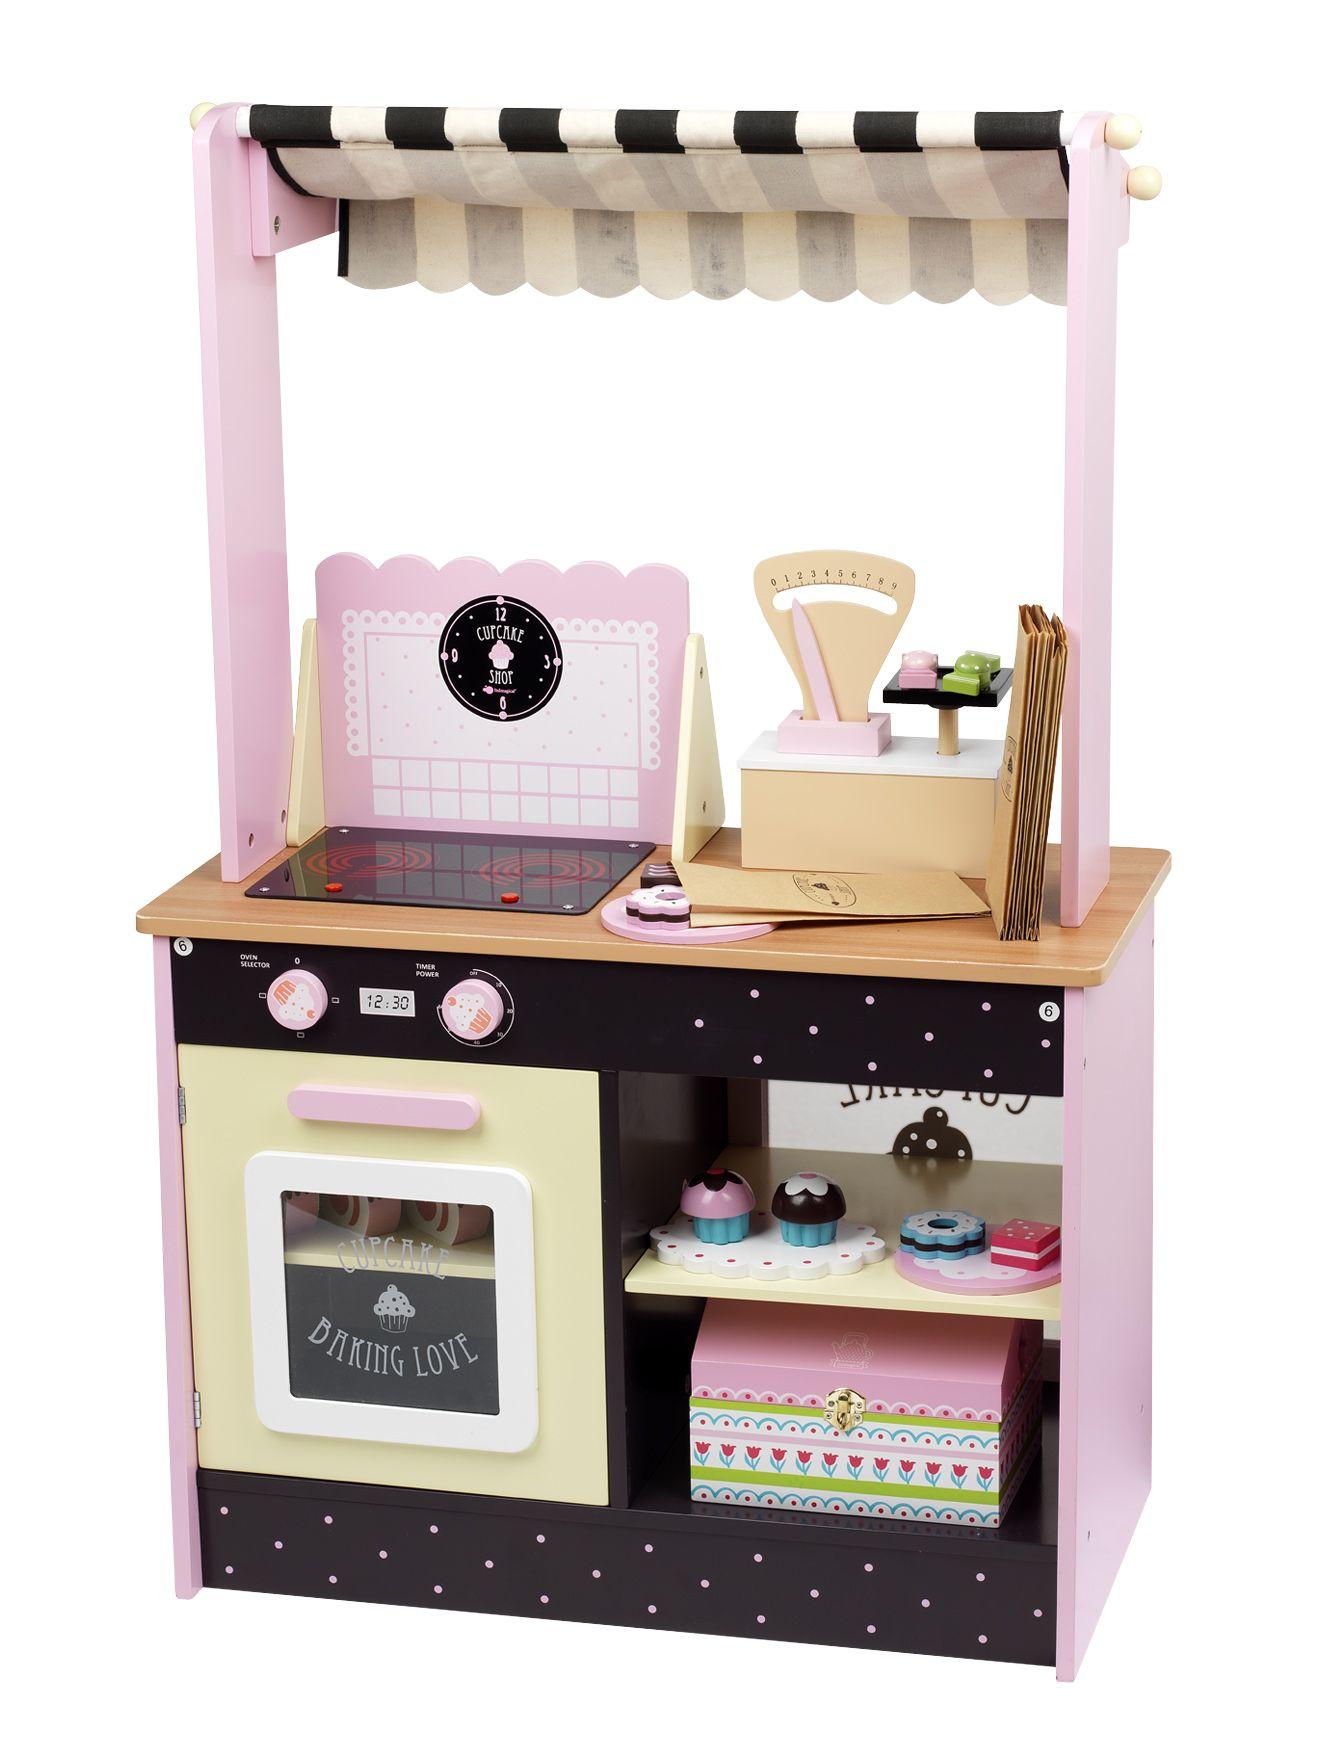 stand natural cupcake shop prix promo vertbaudet ttc jeux et jouets pinterest jeu. Black Bedroom Furniture Sets. Home Design Ideas